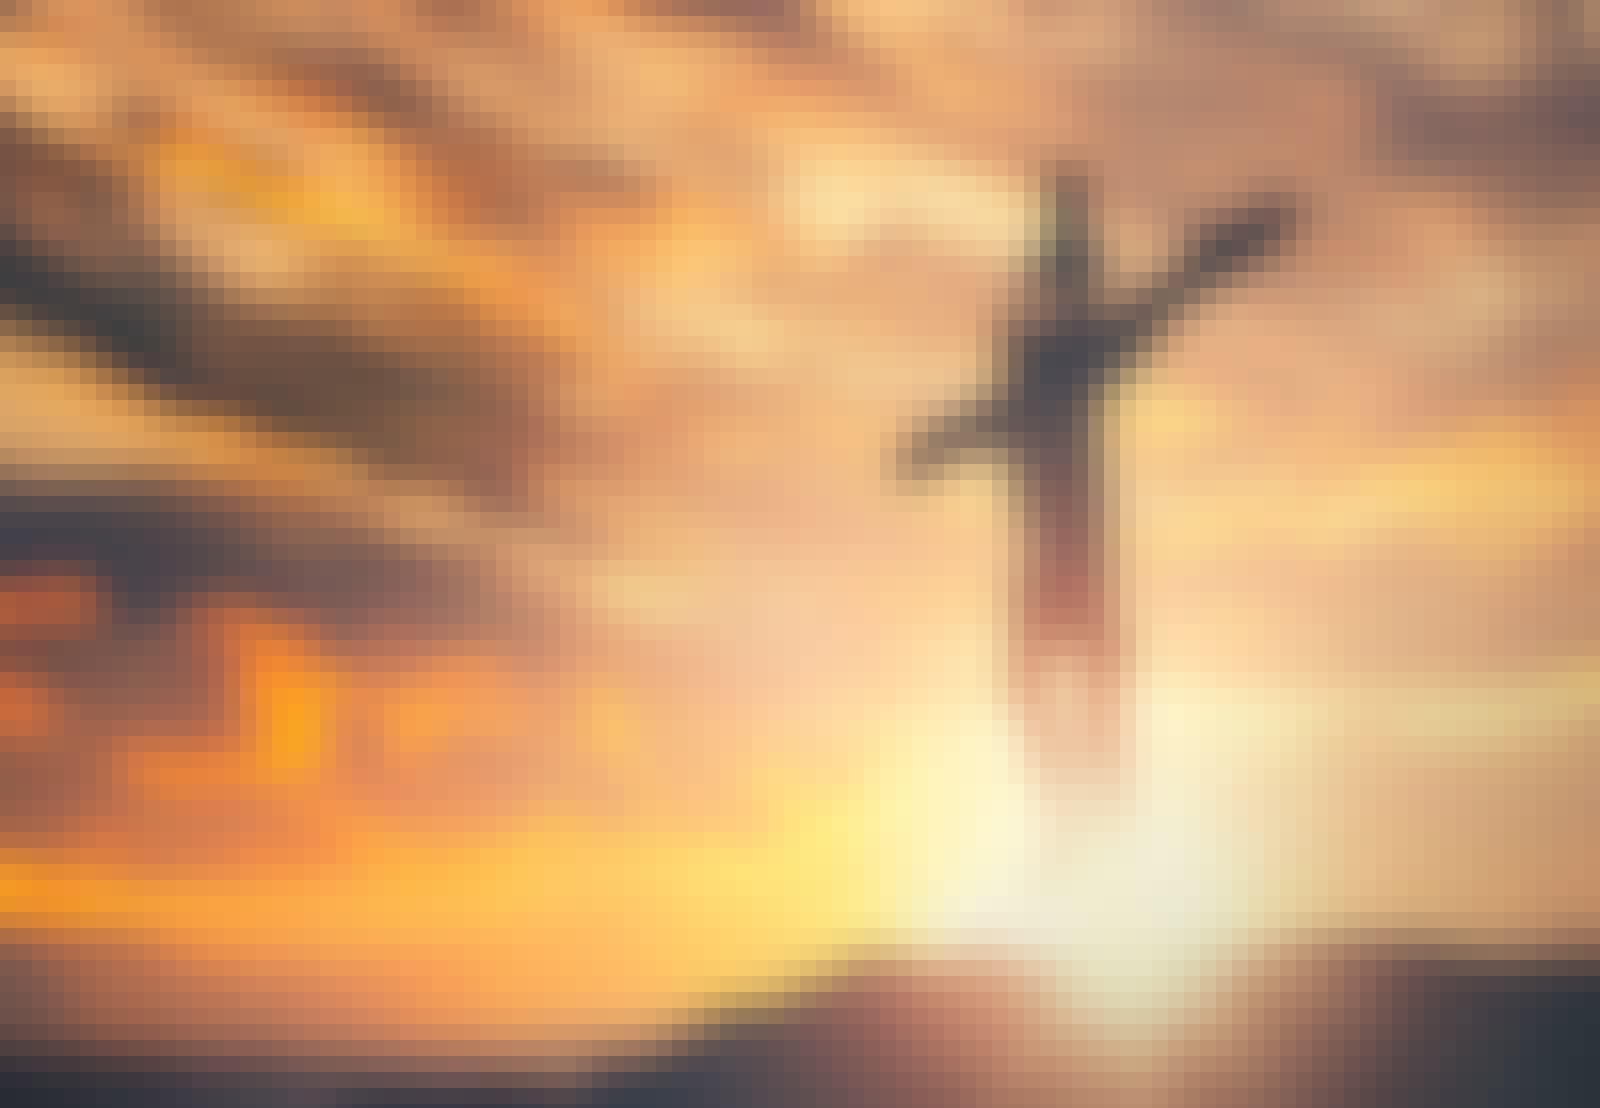 Jesu korsfæstelse